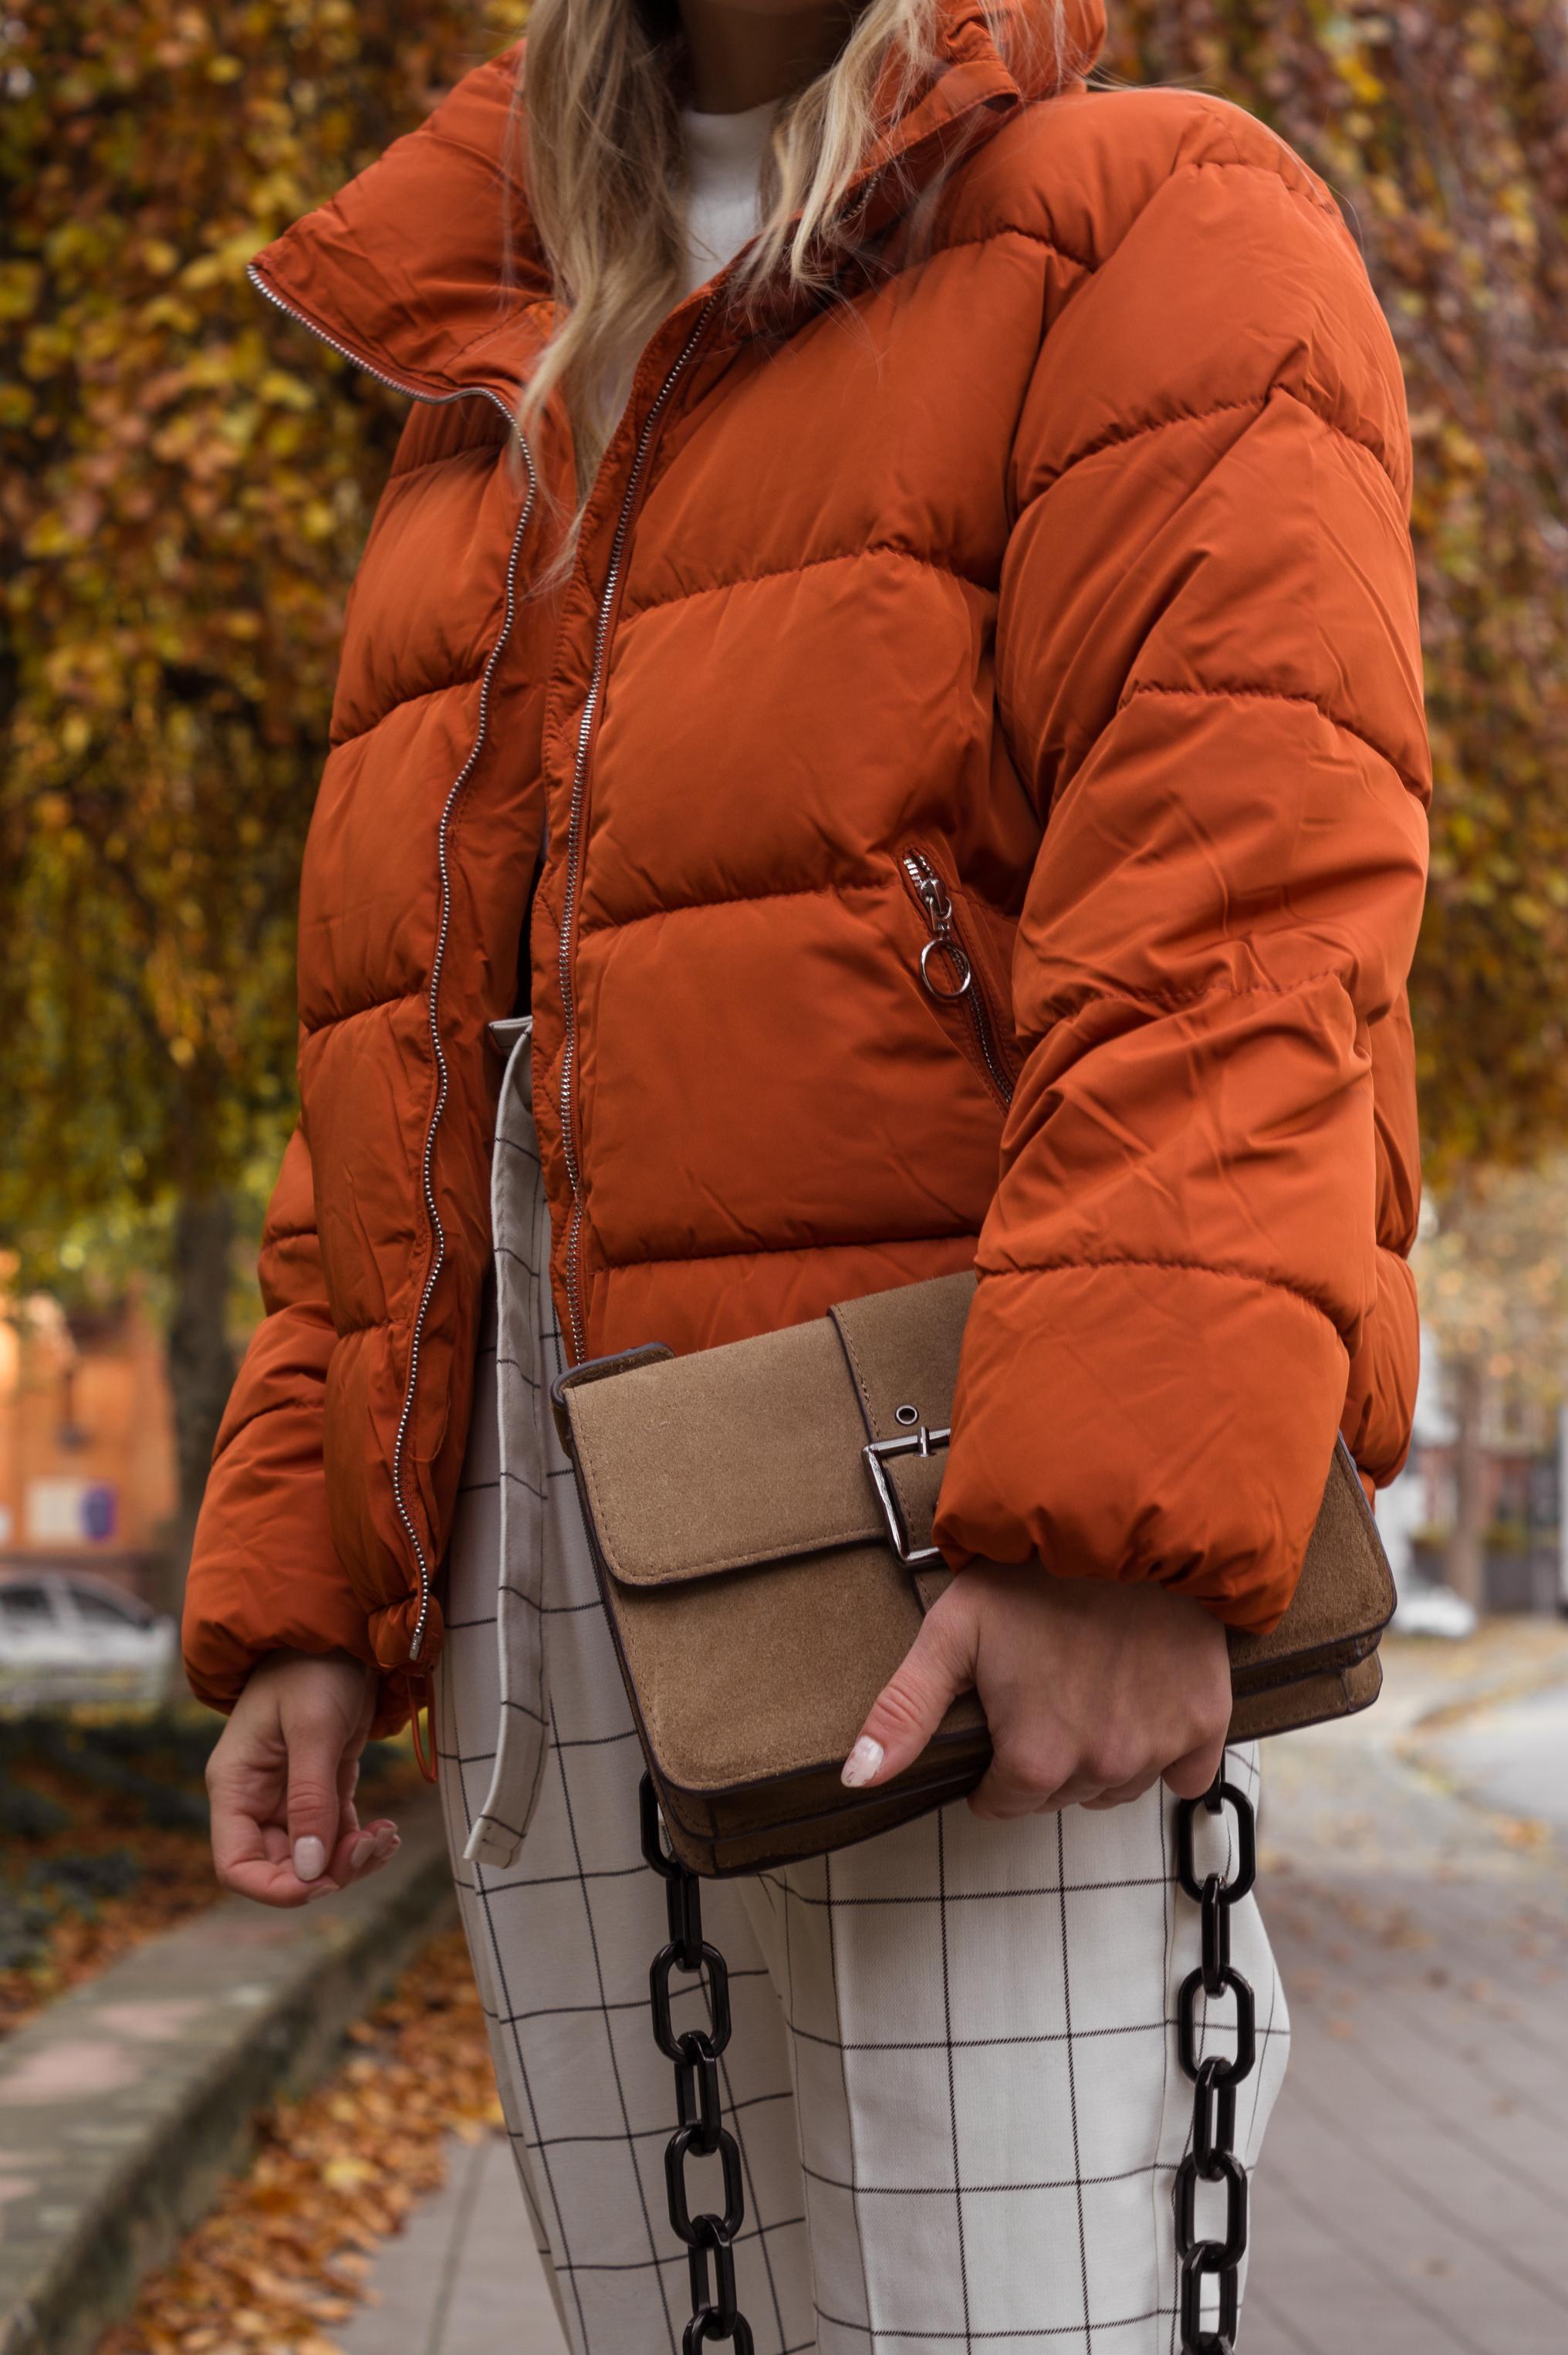 Gola Classics Sneaker Herbslook Trendfarbe Orange Daunenjacke Puffjacket Streetstyle Sariety Modeblog Heidelberg Fashionblogger_15